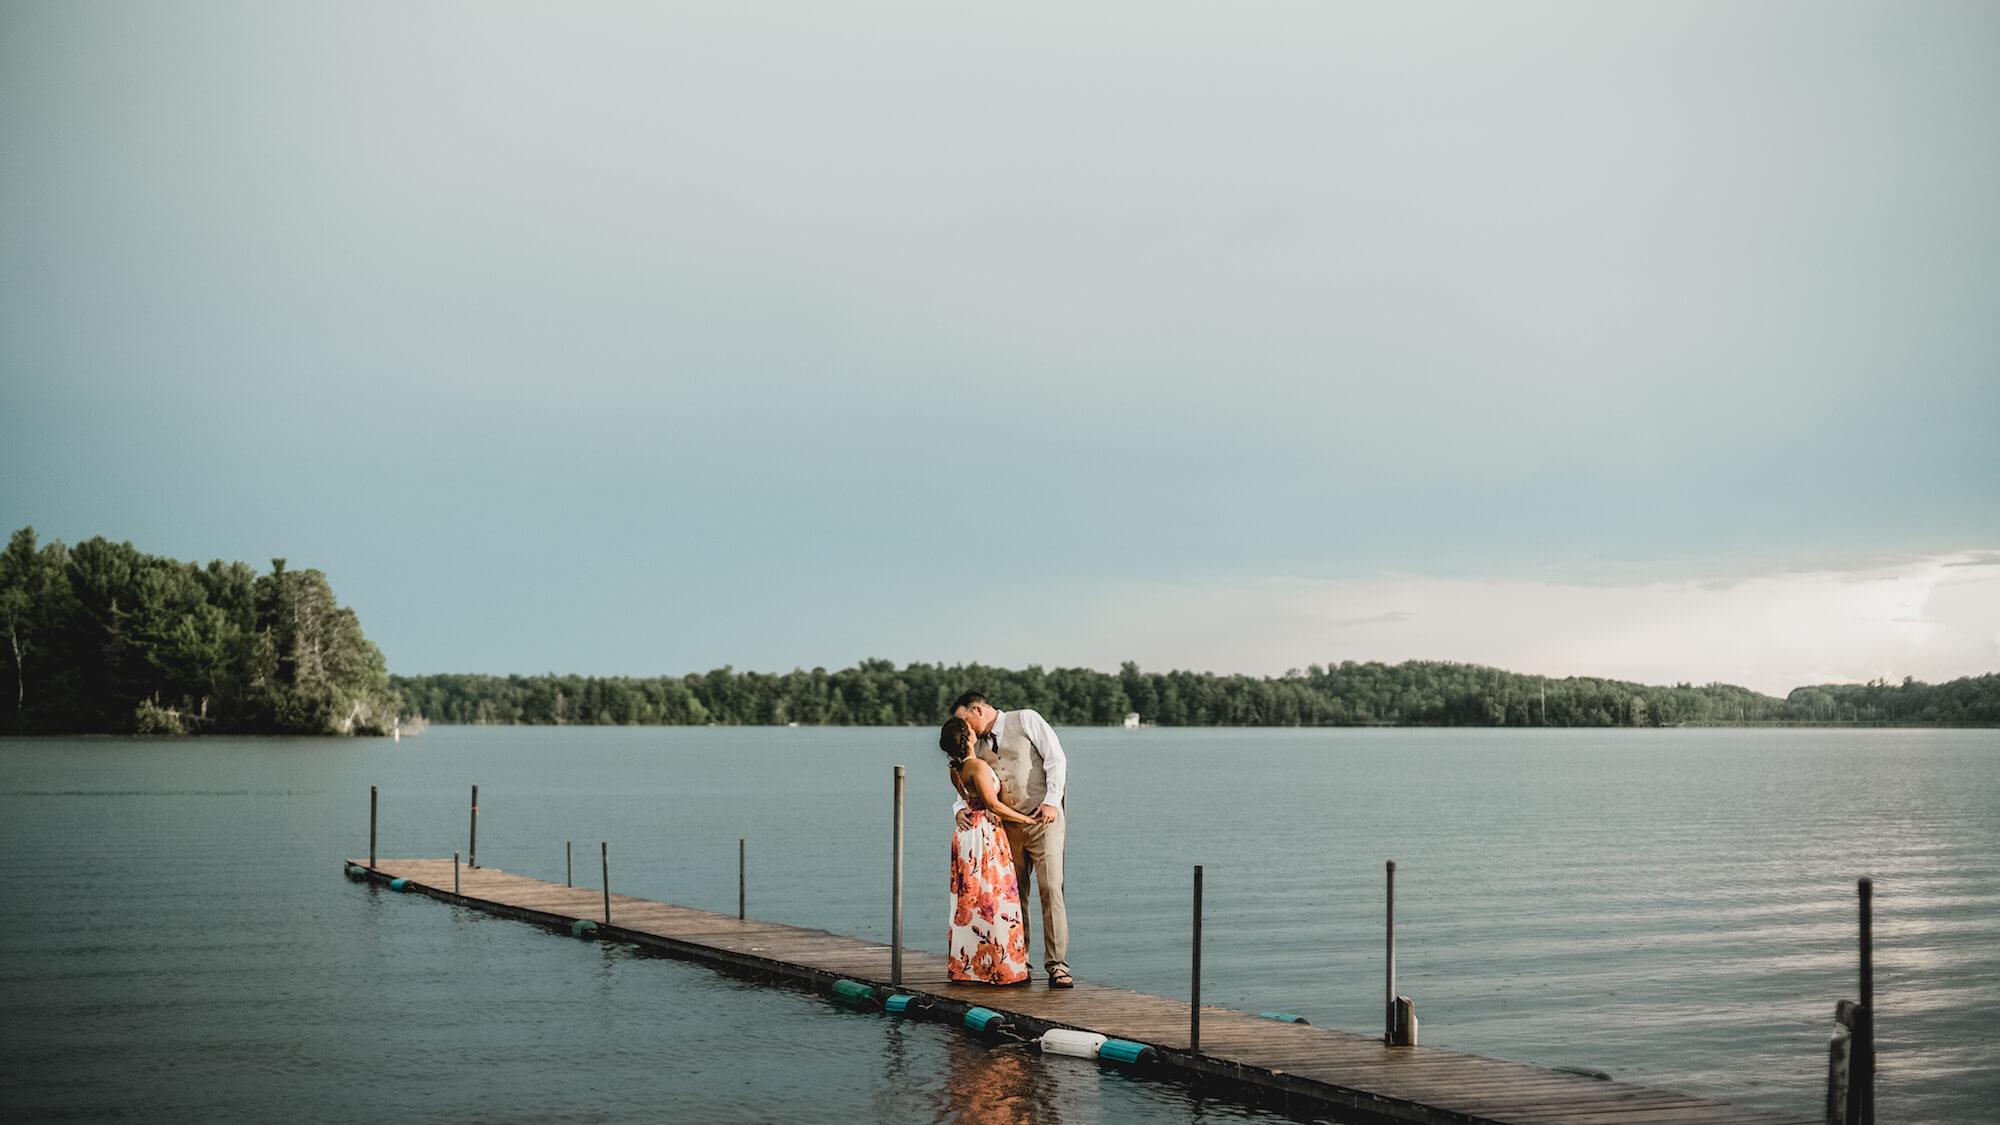 engle-olson-maddy-pat-mn-wedding-photography-42.jpg